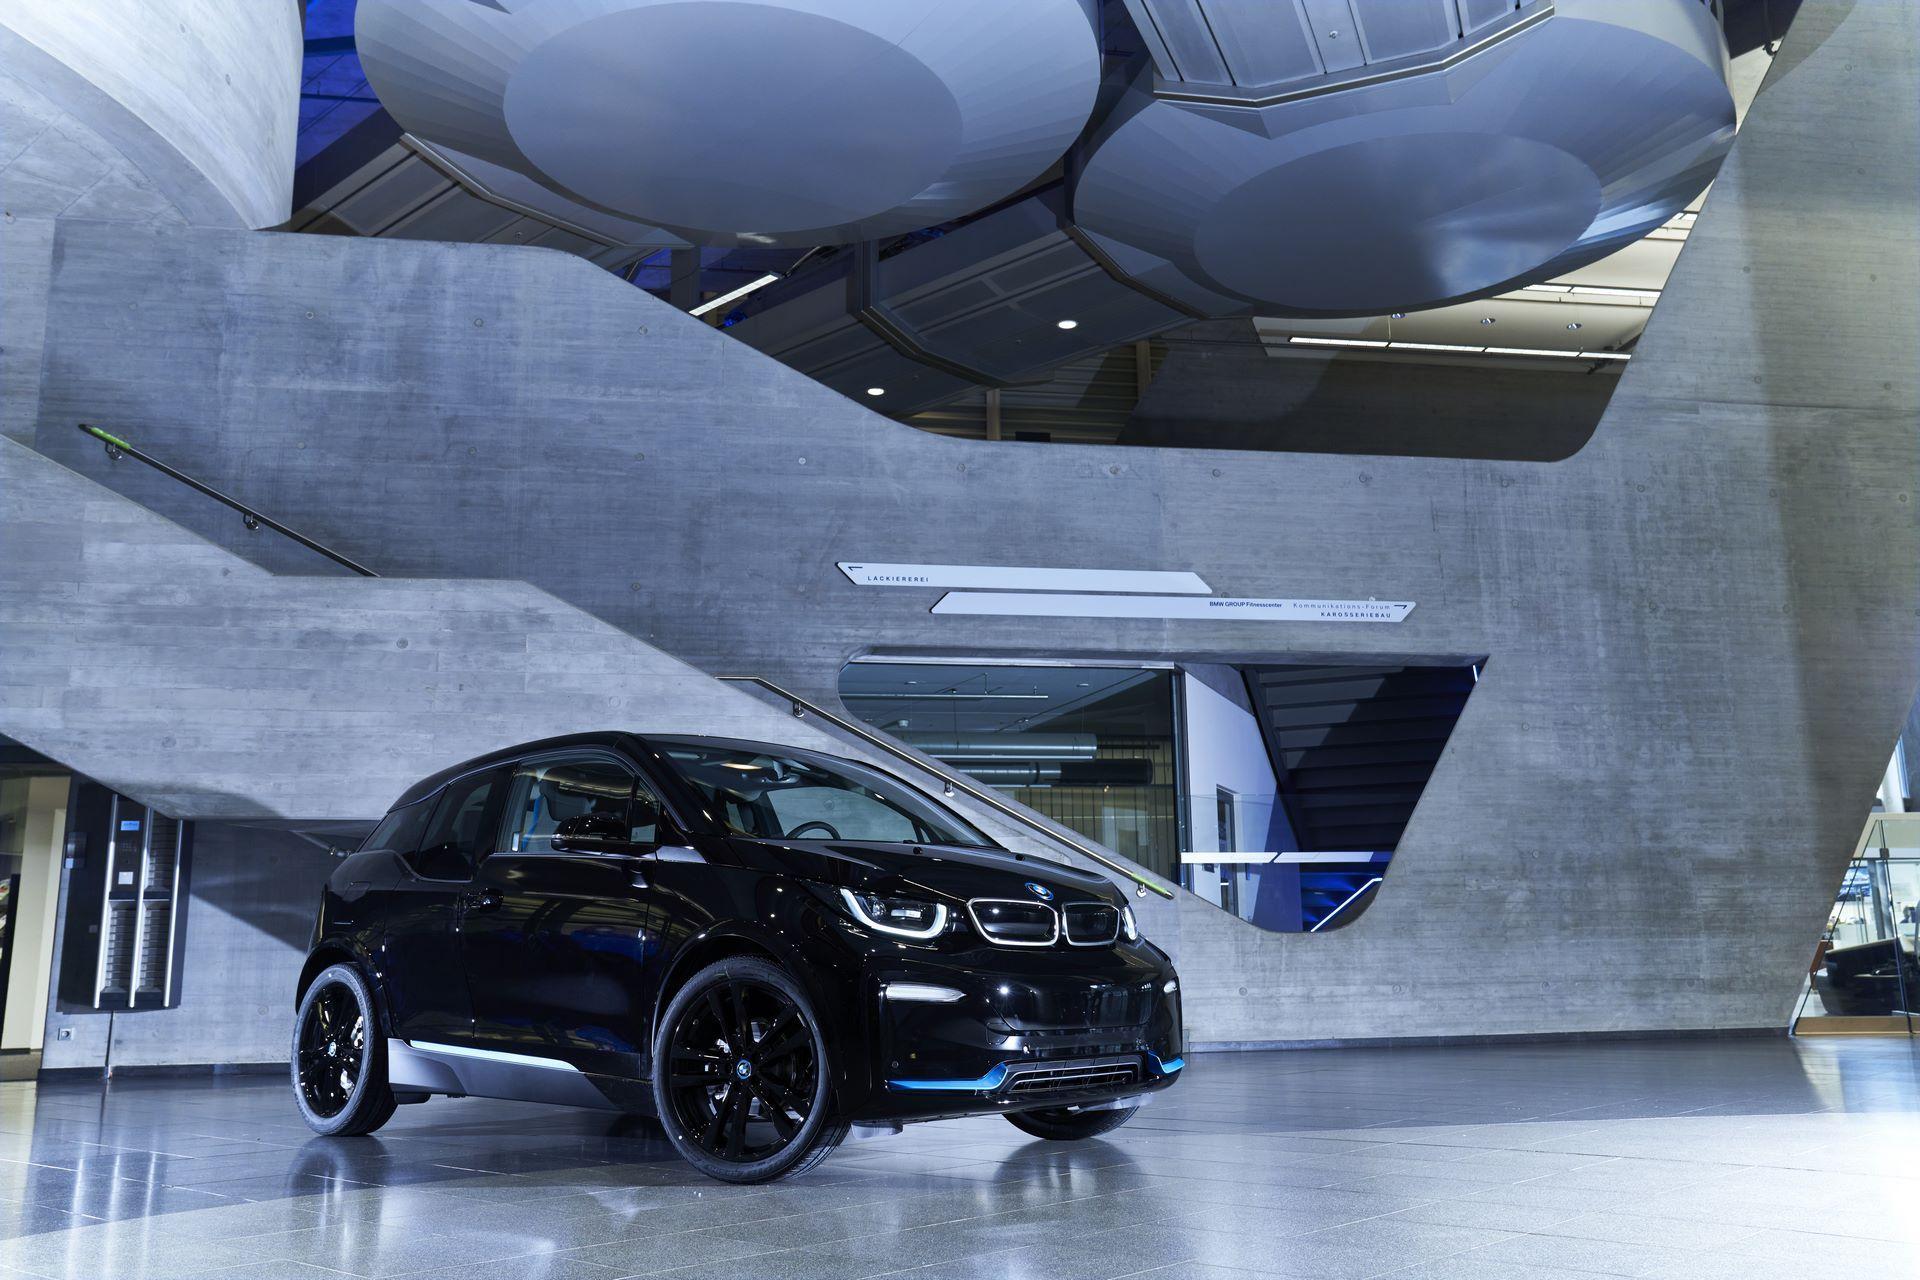 BMW-i8-plant-production-76